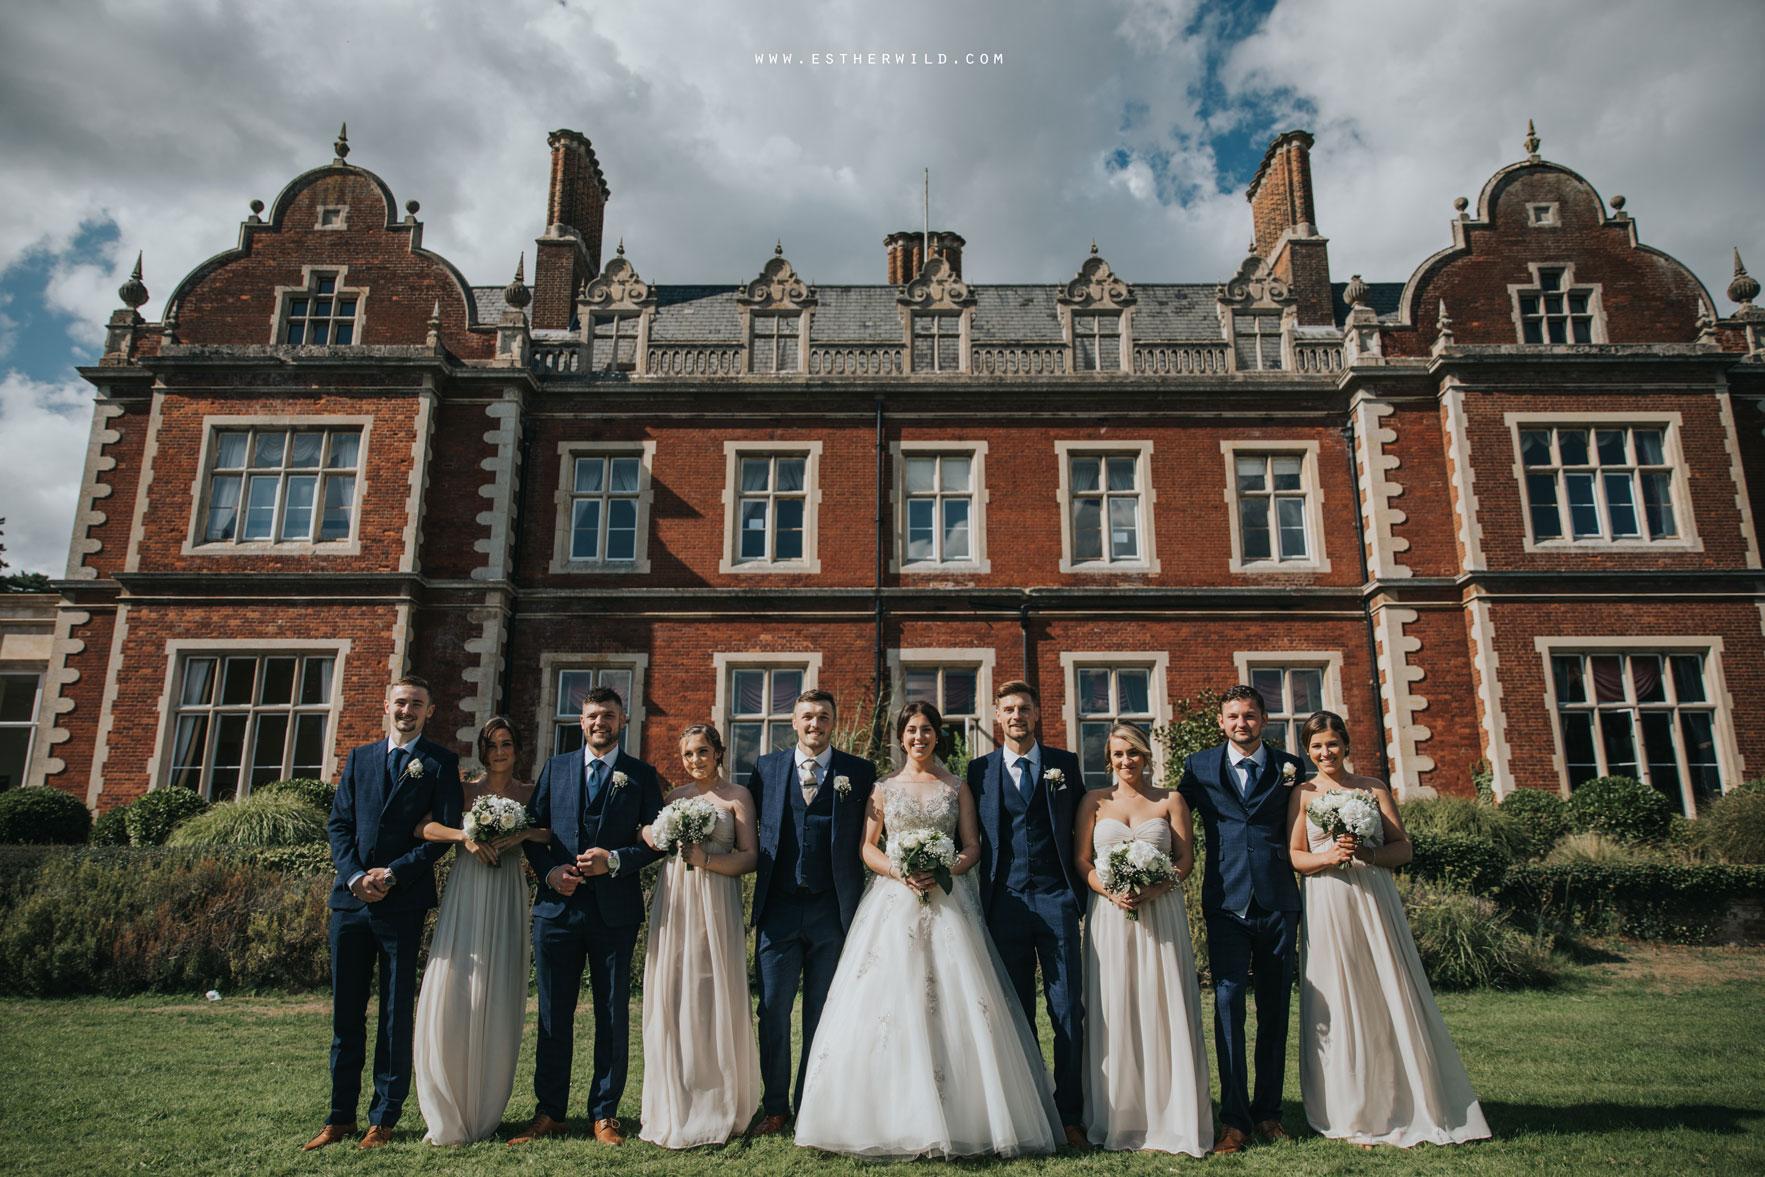 Lynford_Hall_Wedding_Thetford_Mundford_Esther_Wild_Photographer_IMG_1894.jpg